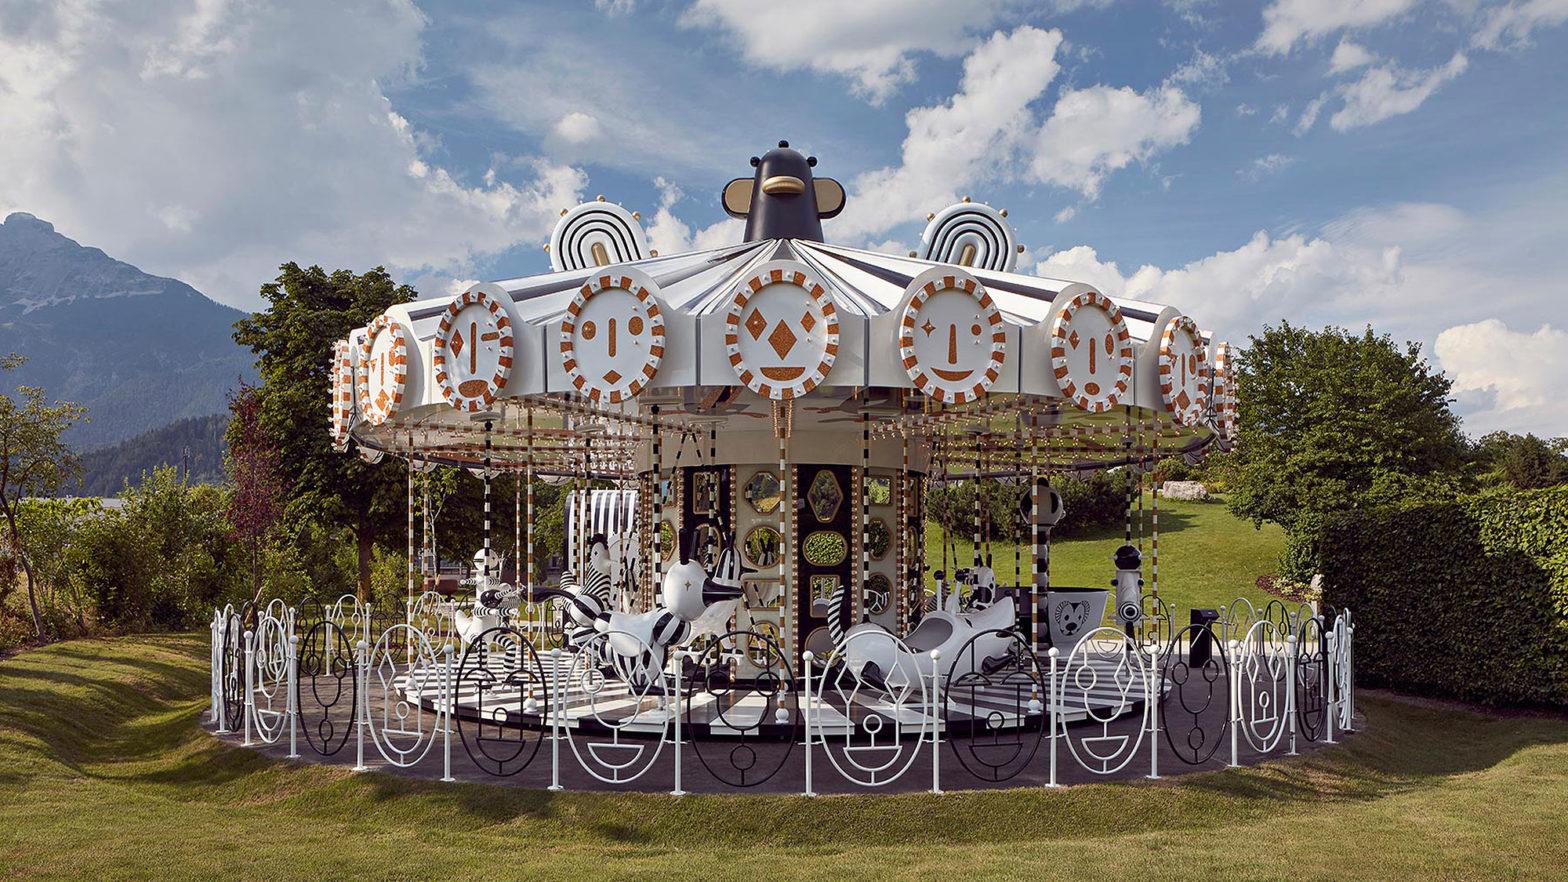 Swarovski Kristallwelten Crystallized Carousel